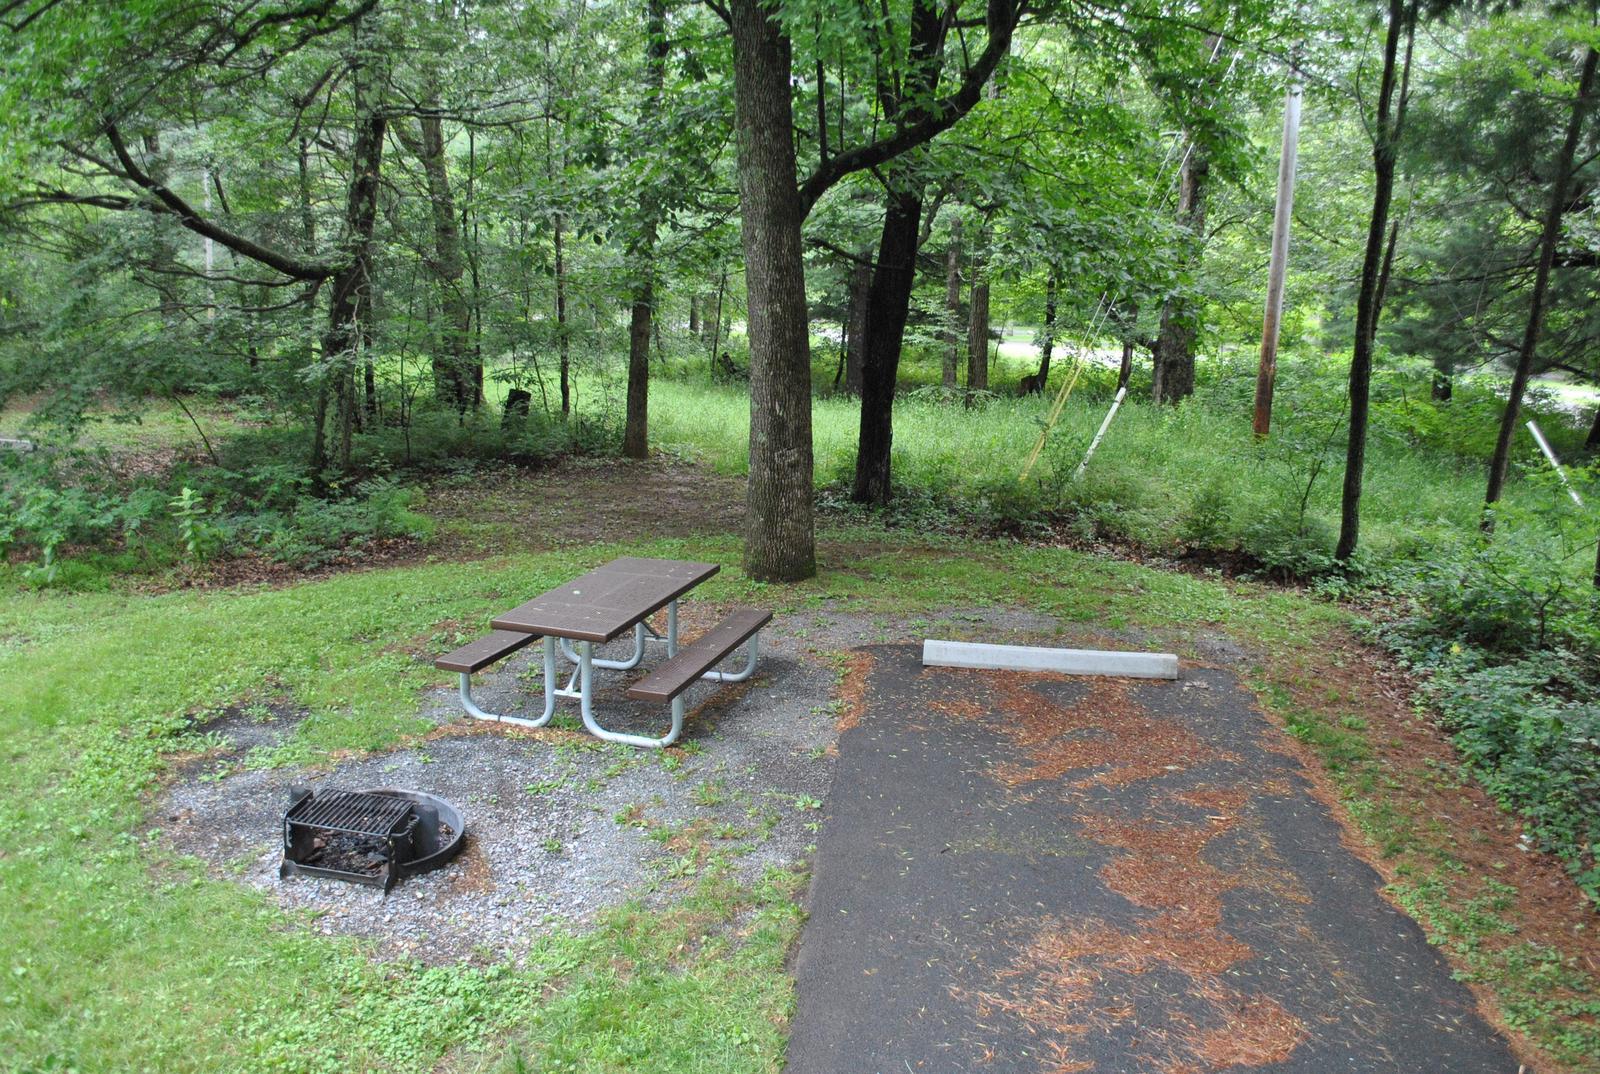 Mathews Arm Campground – Site A016